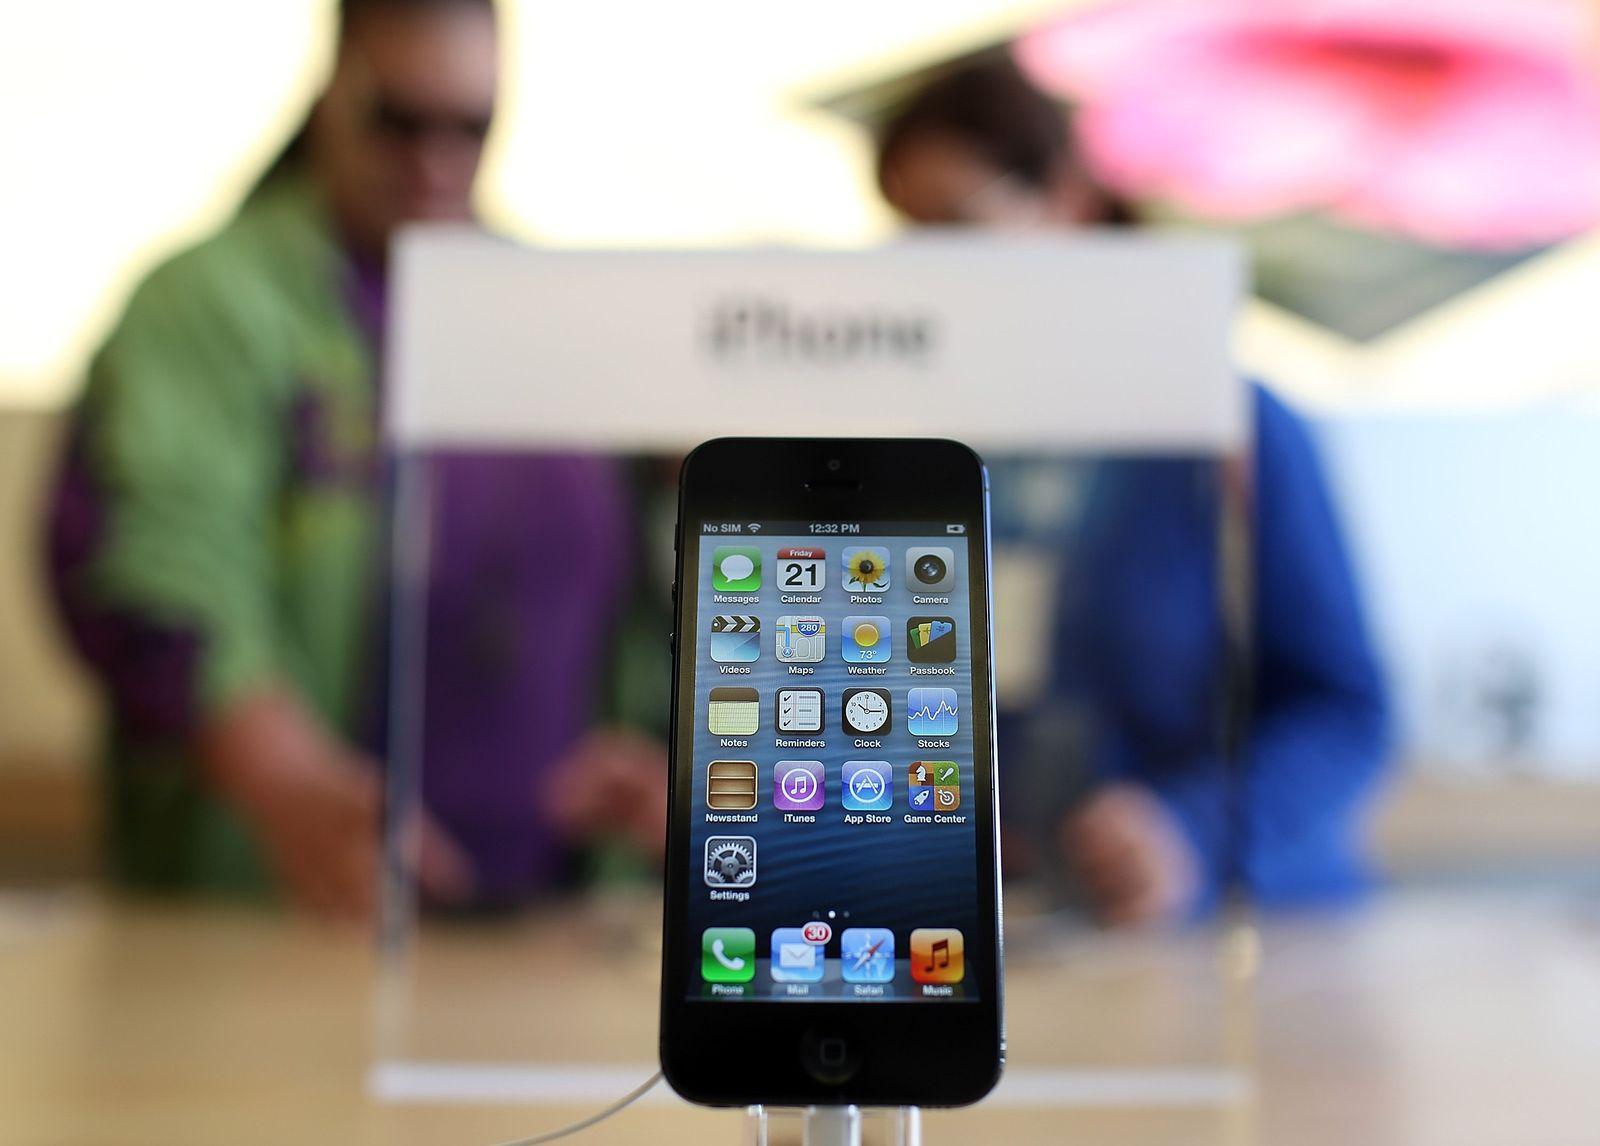 Apple / iPhone 5